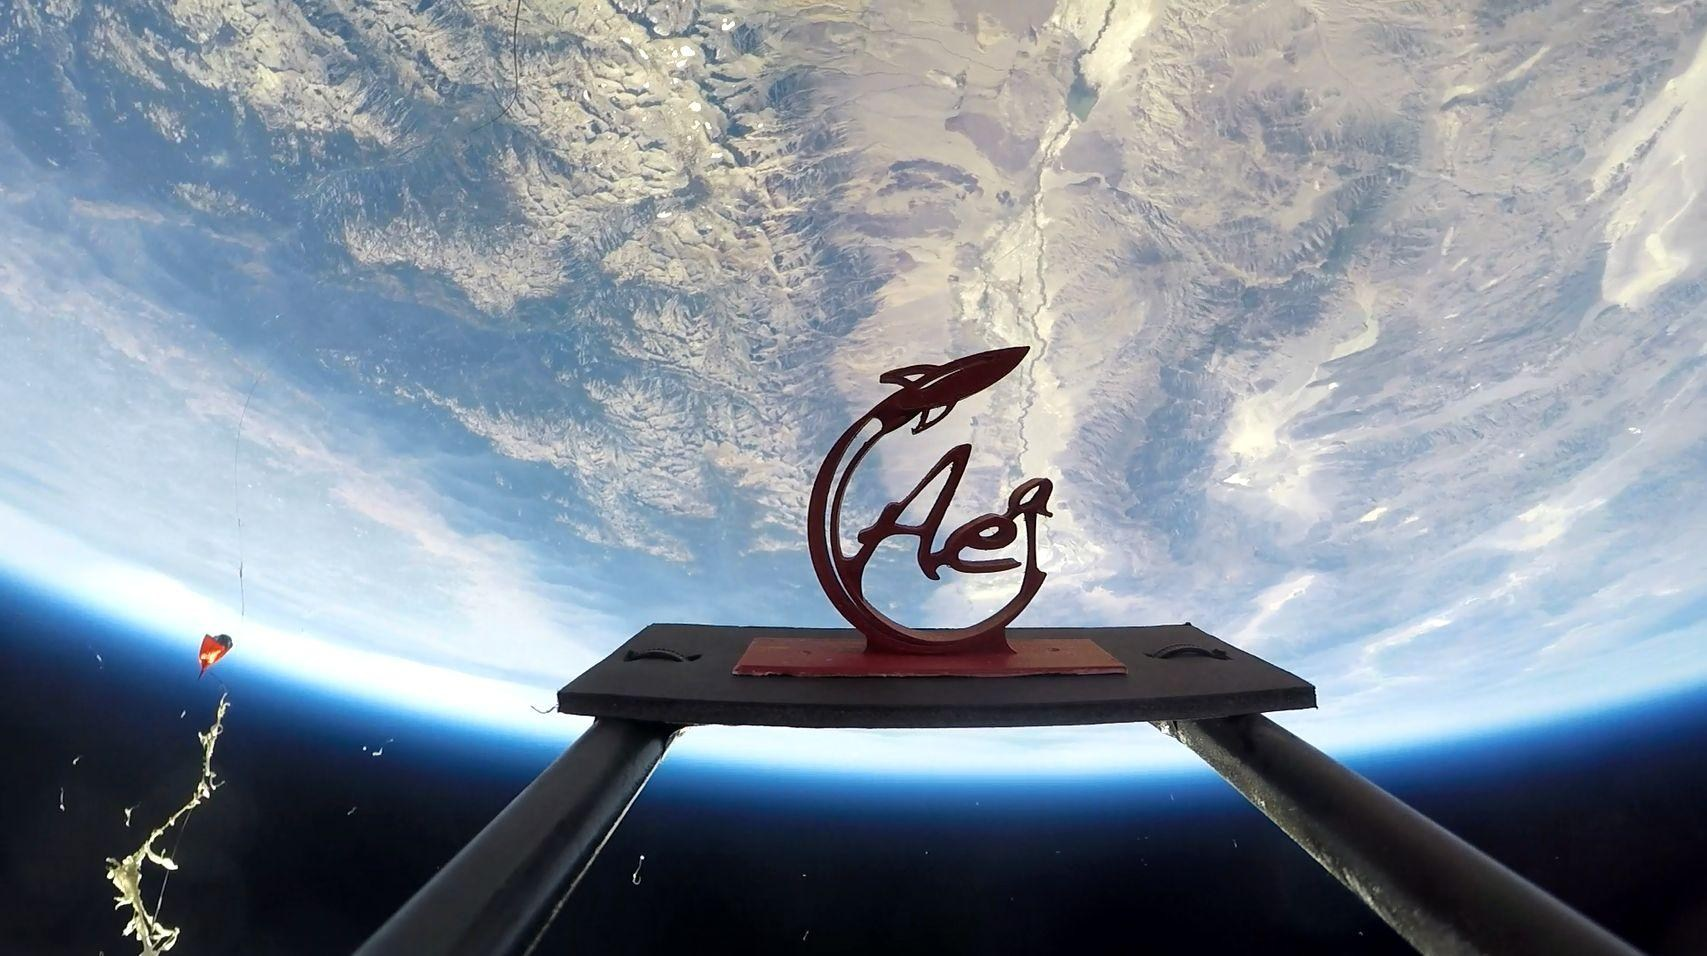 AEA logo in space